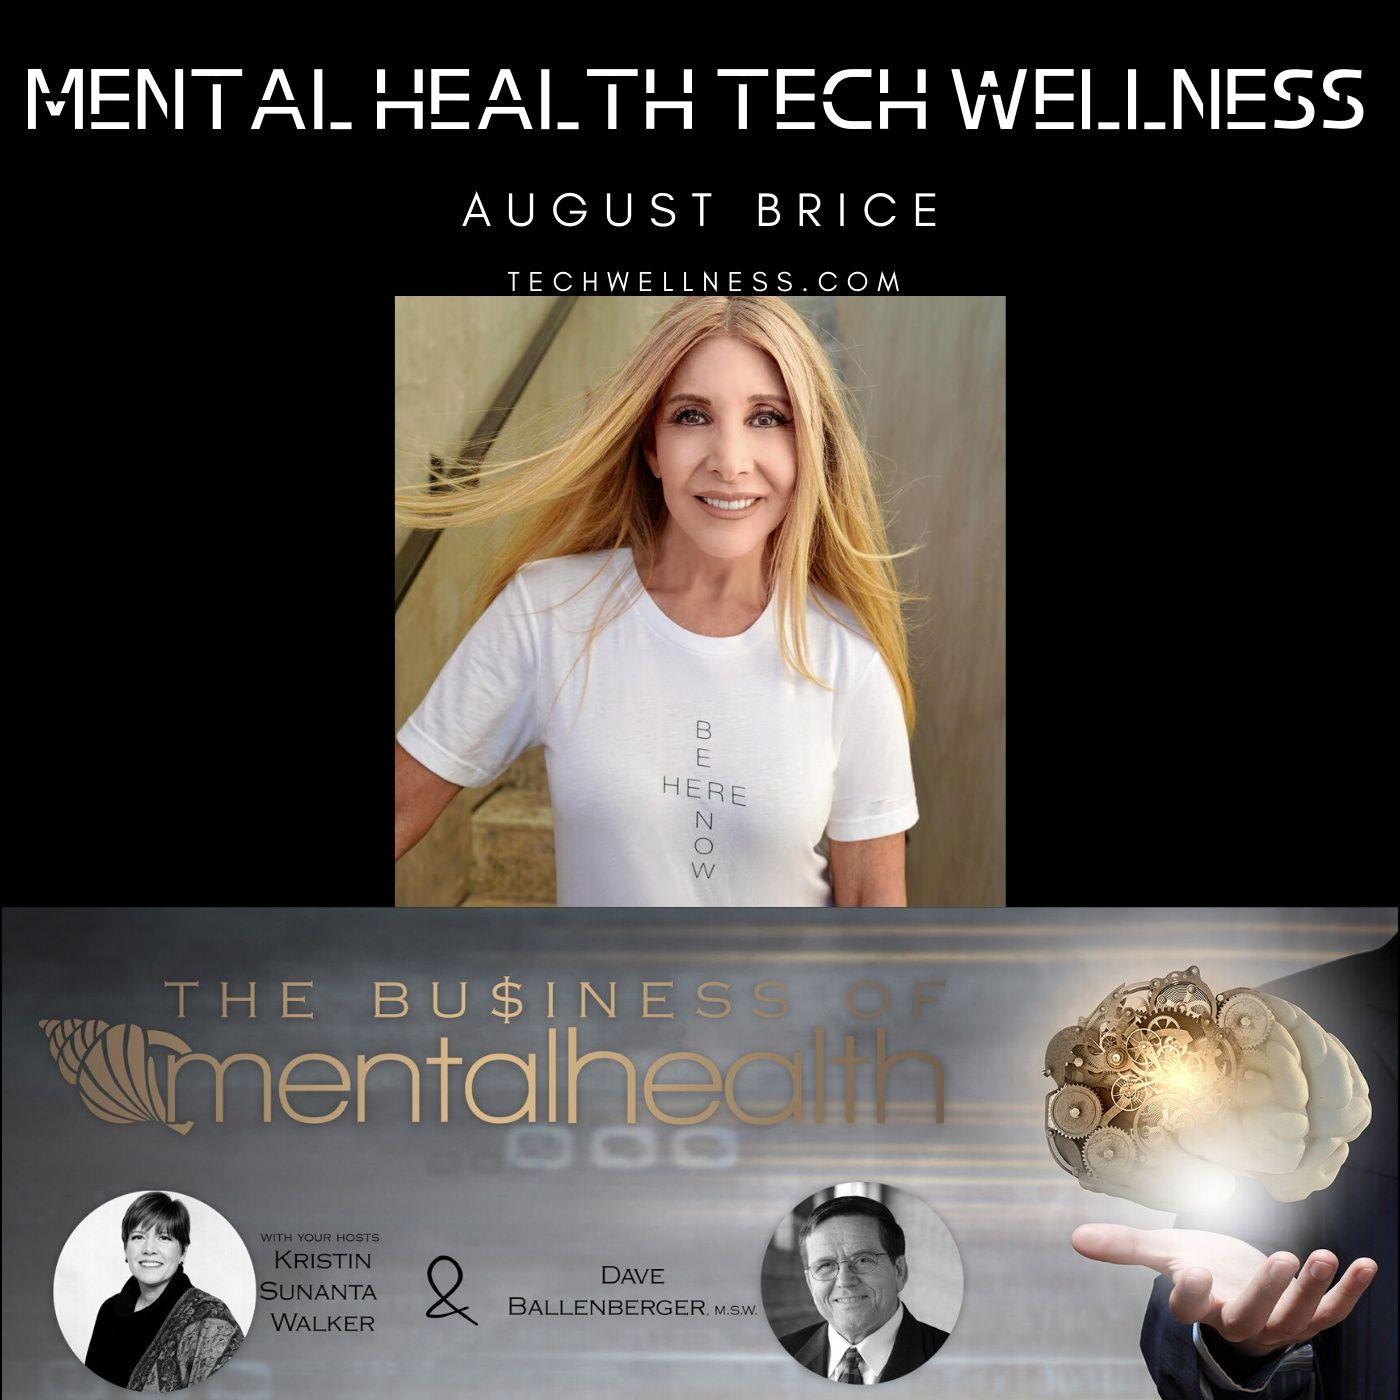 Mental Health News Radio - Mental Health Tech Wellness